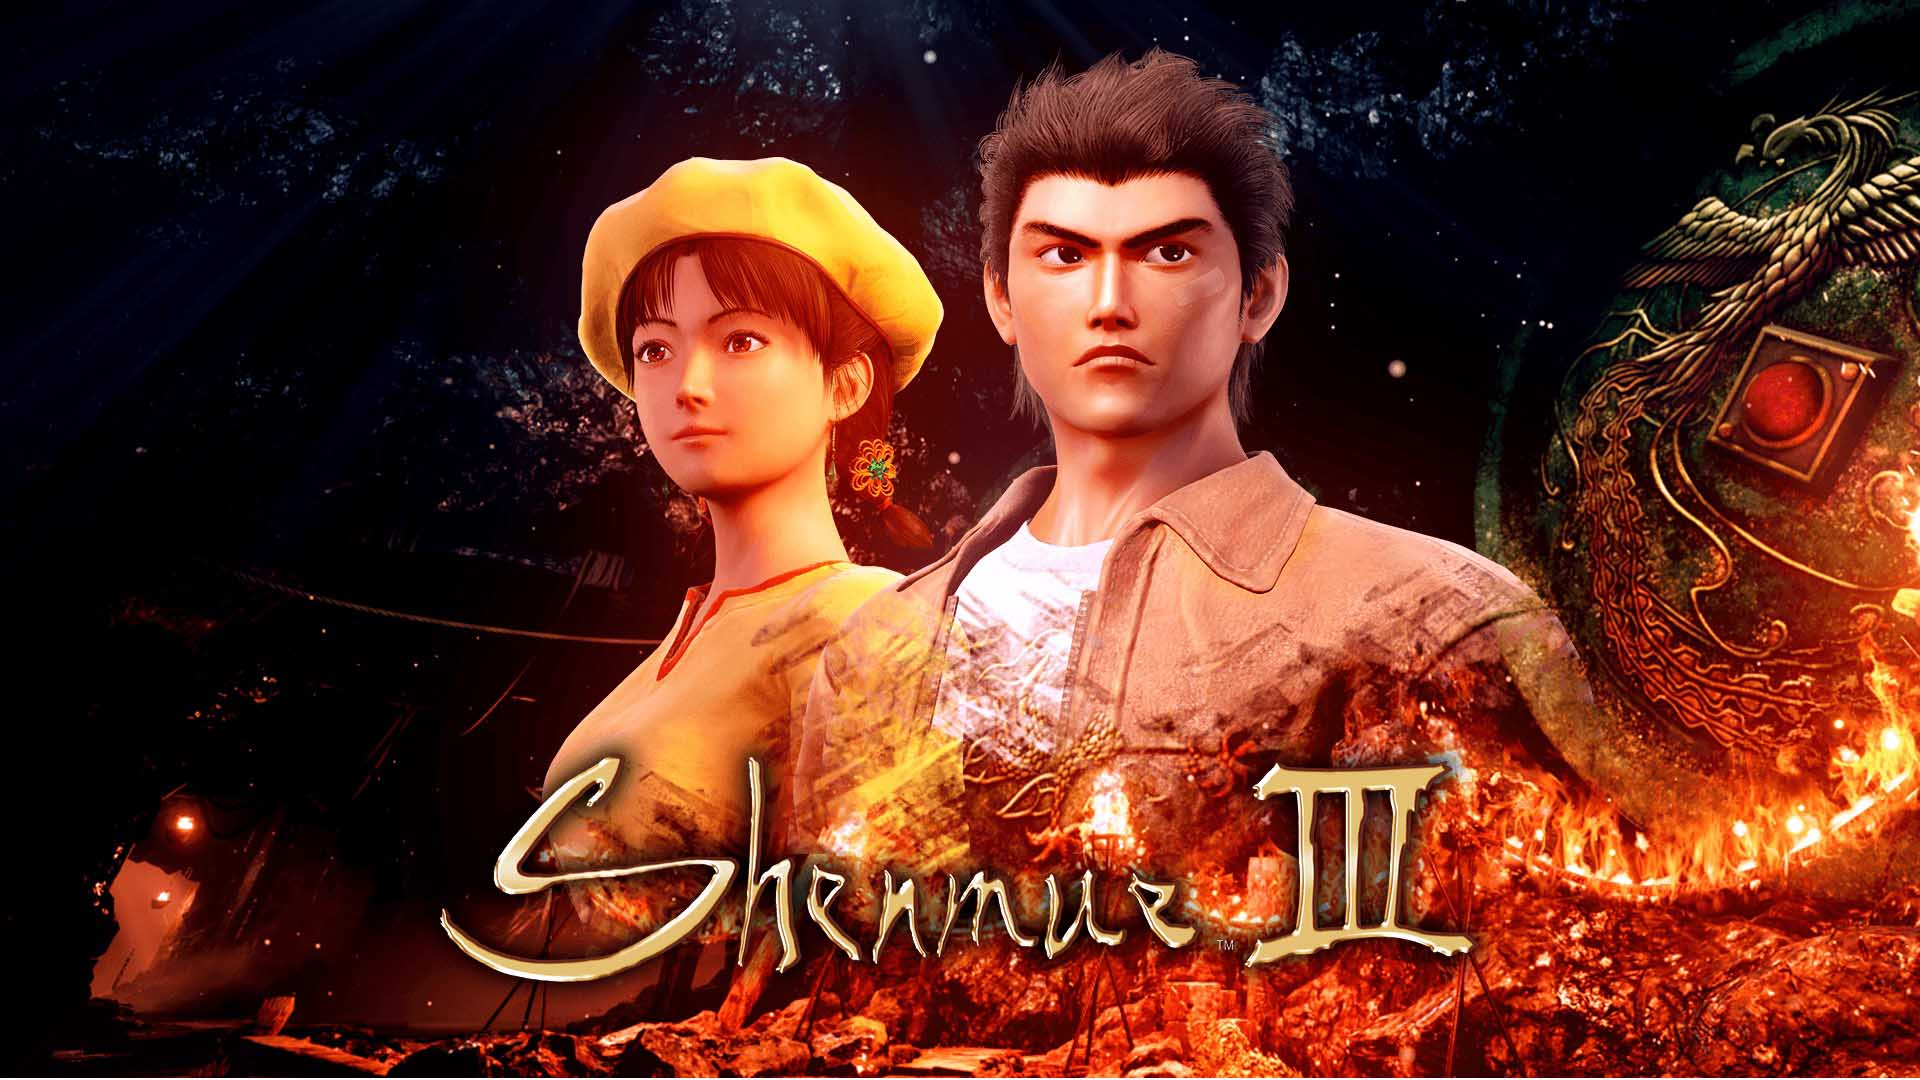 shenmue 3 ys net epic games refund